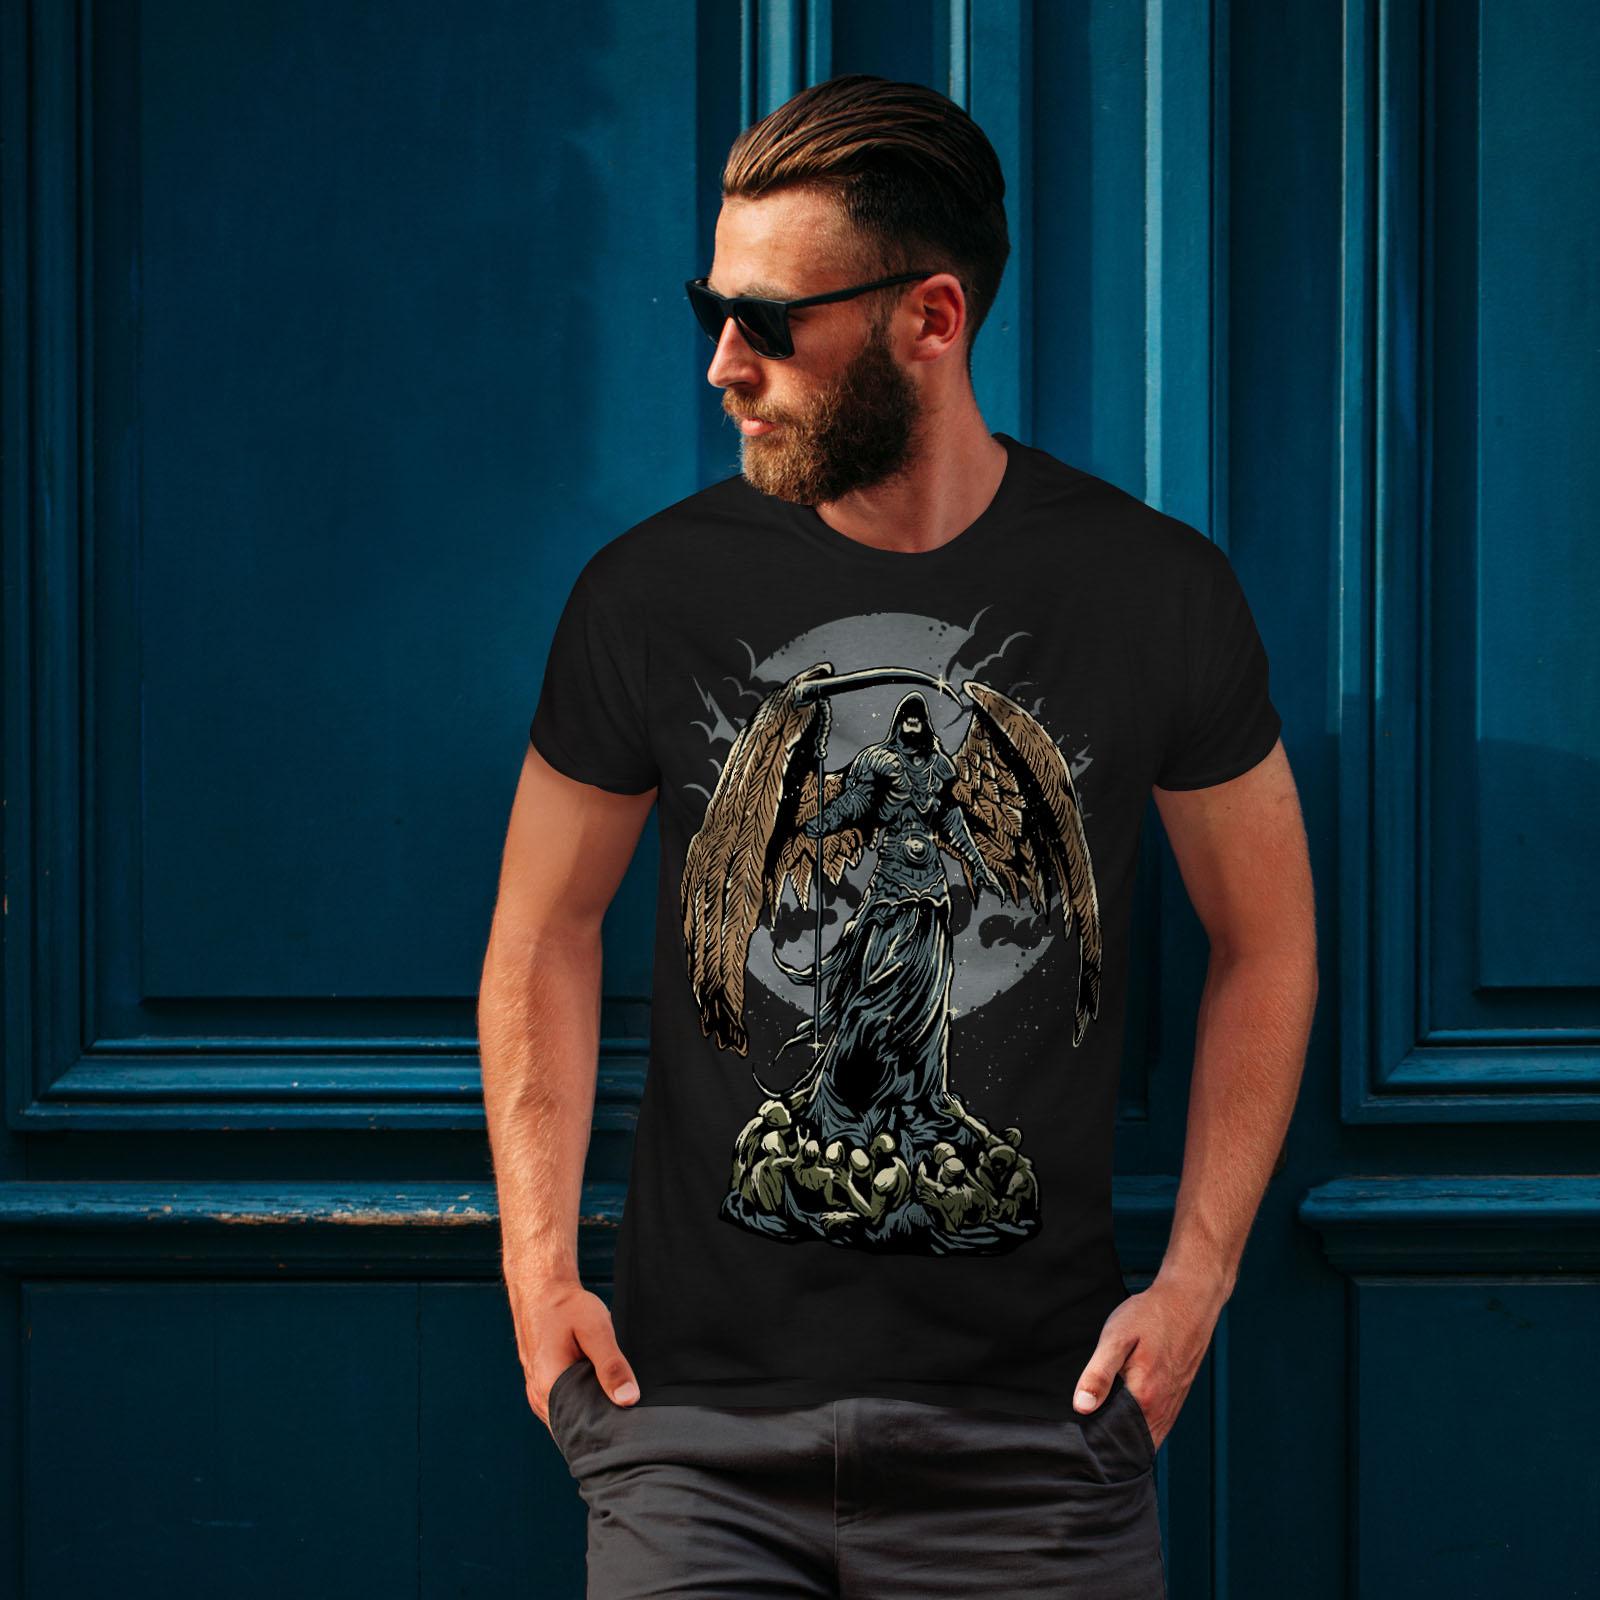 Wellcoda-Evil-Grim-Reaper-Mens-T-shirt-Horror-Graphic-Design-Printed-Tee thumbnail 4